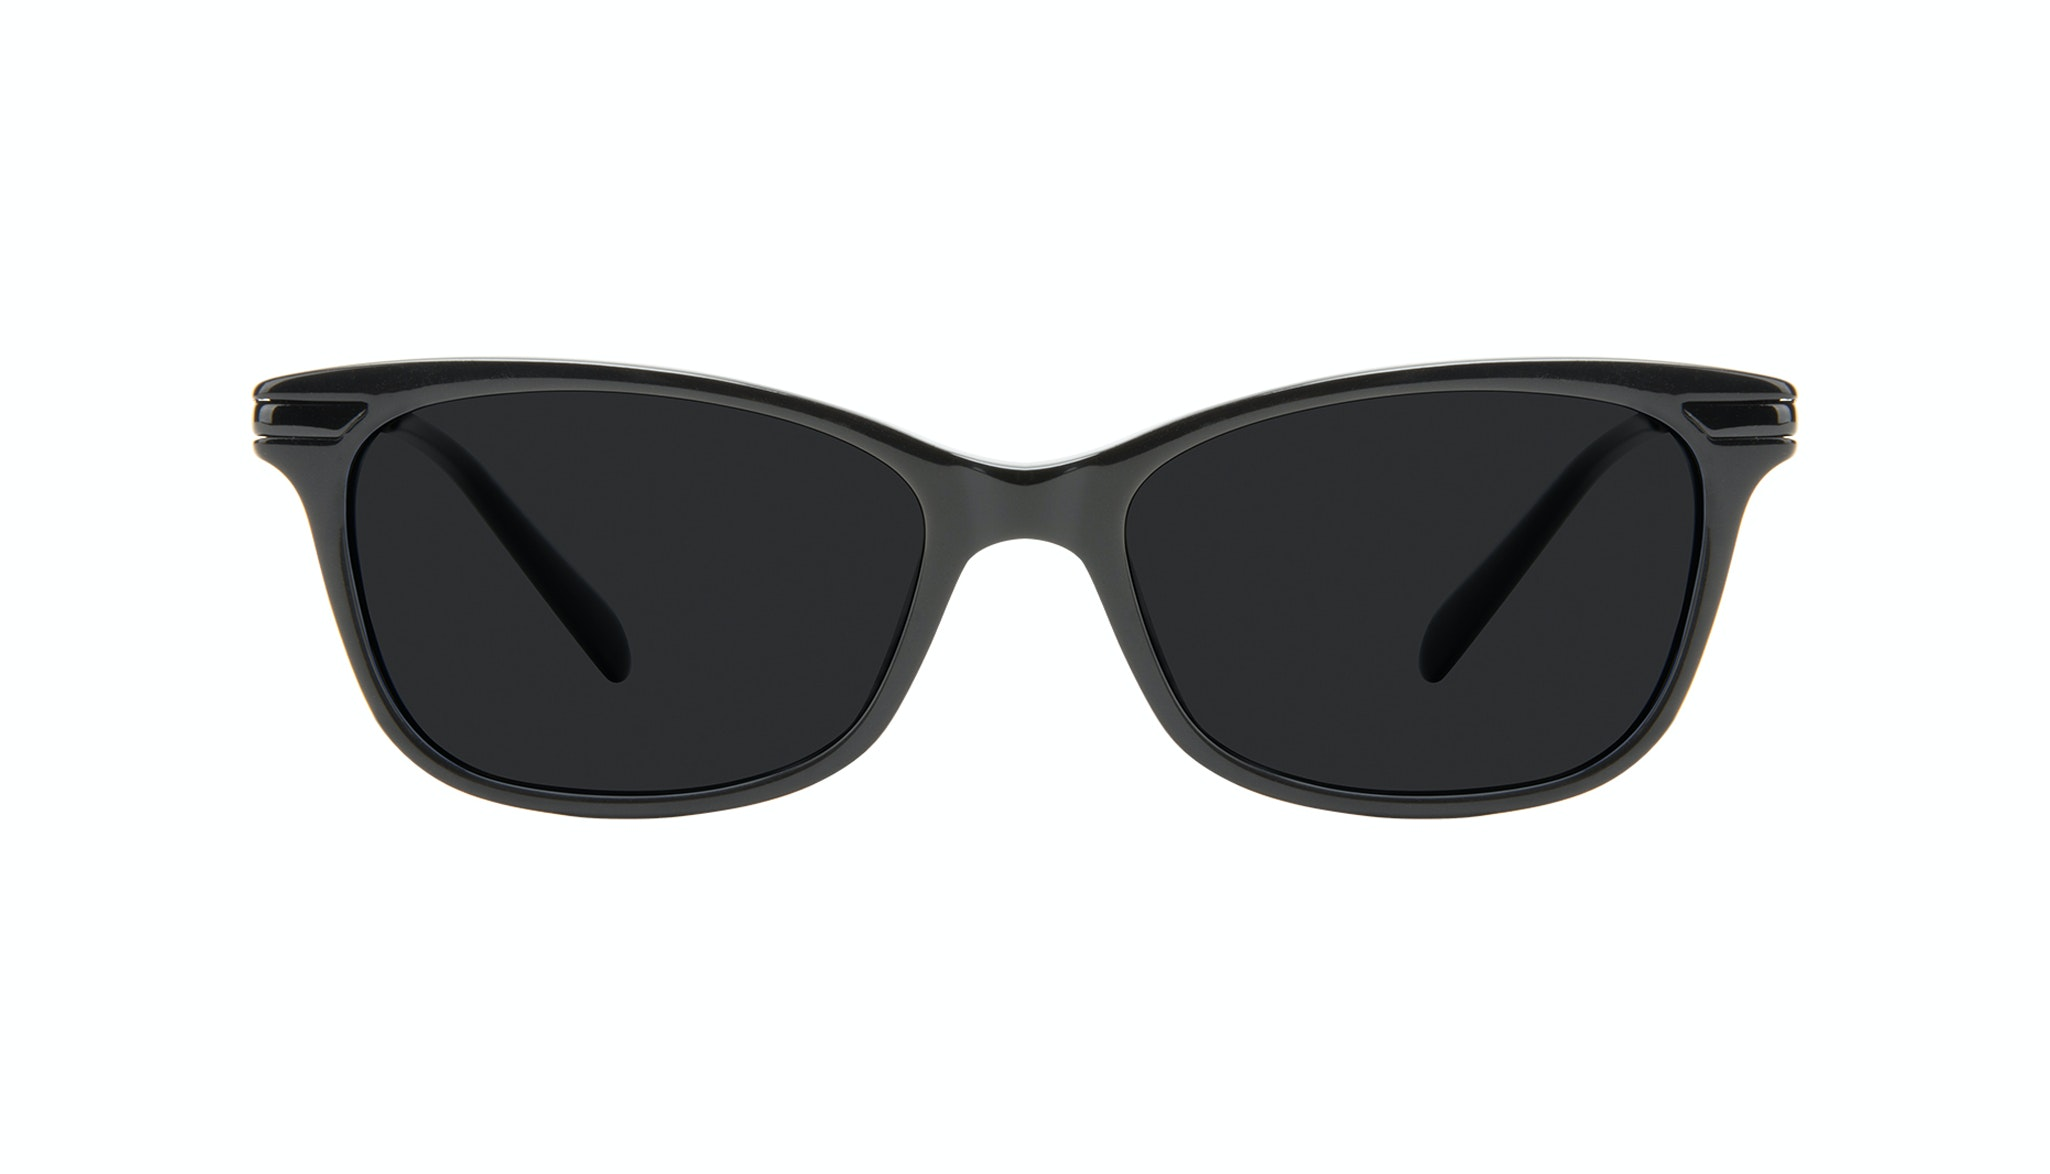 Affordable Fashion Glasses Rectangle Sunglasses Women Comet II Onyx